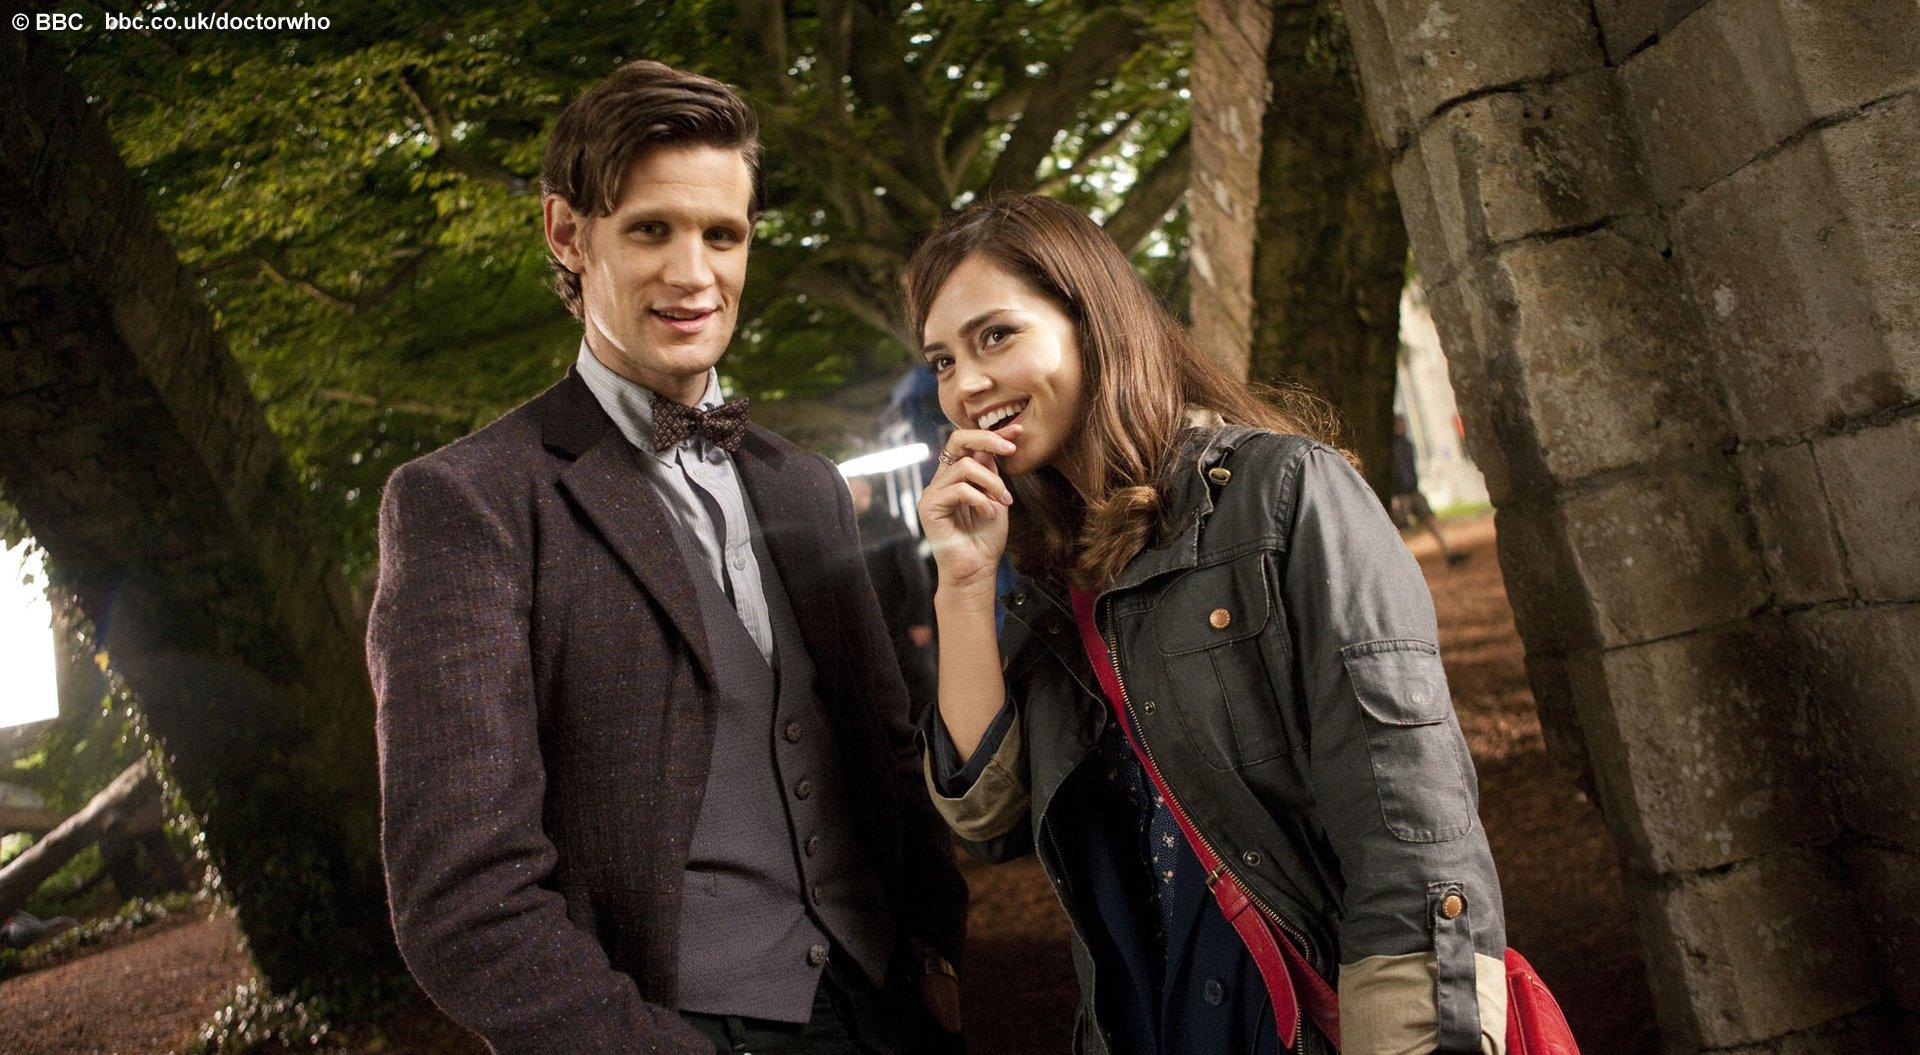 Free Download Bbc Latest News Doctor Who Matt Smith And Jenna